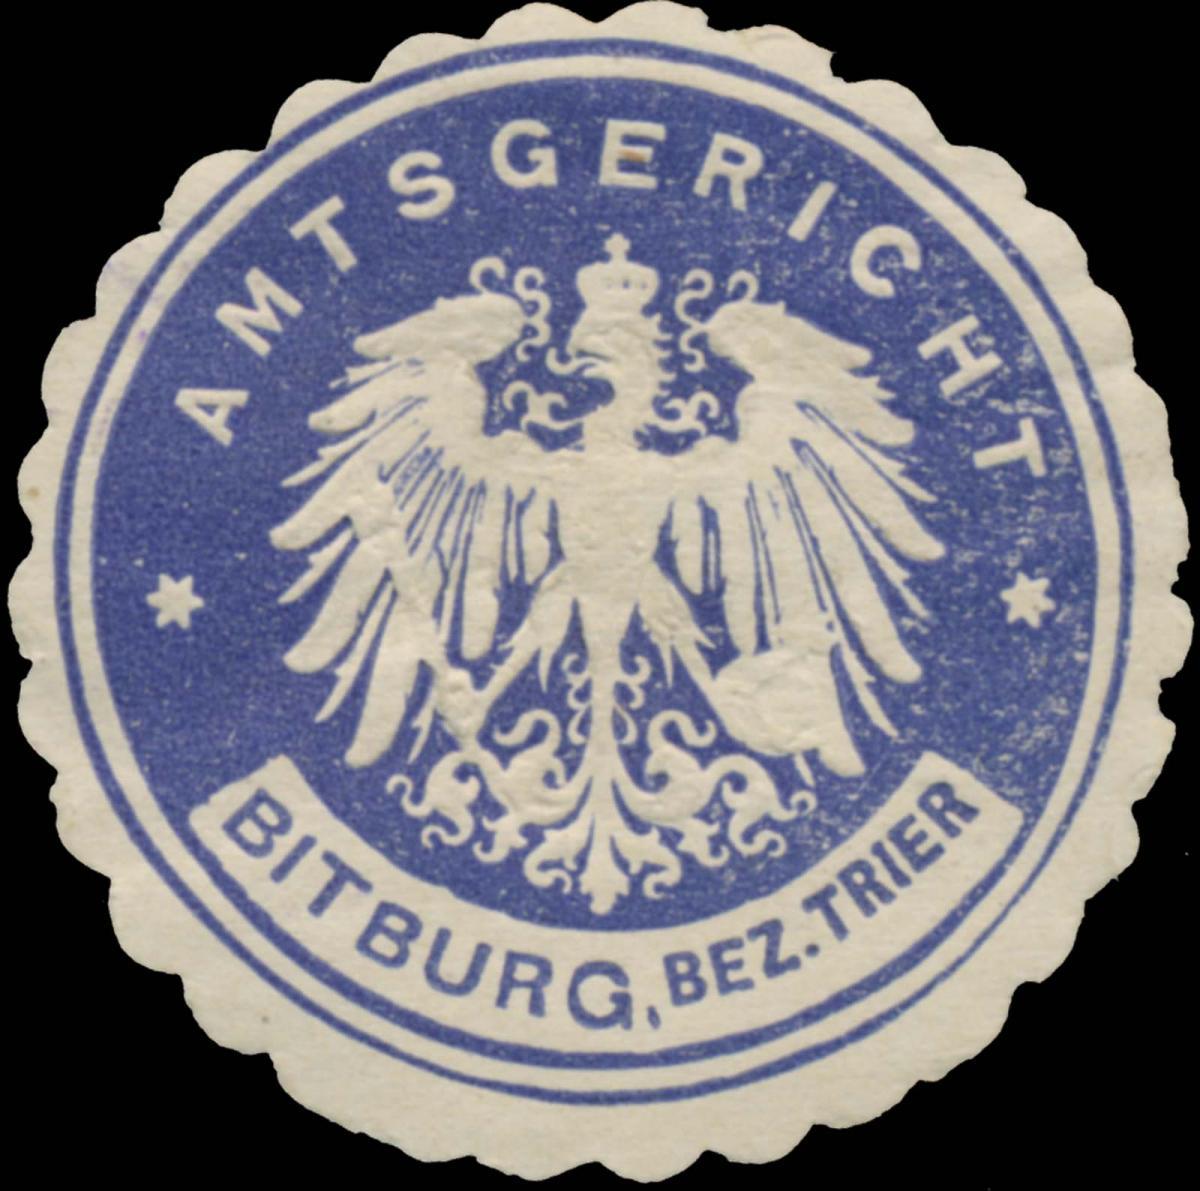 Amtsgericht Bitburg Bezirk Trier